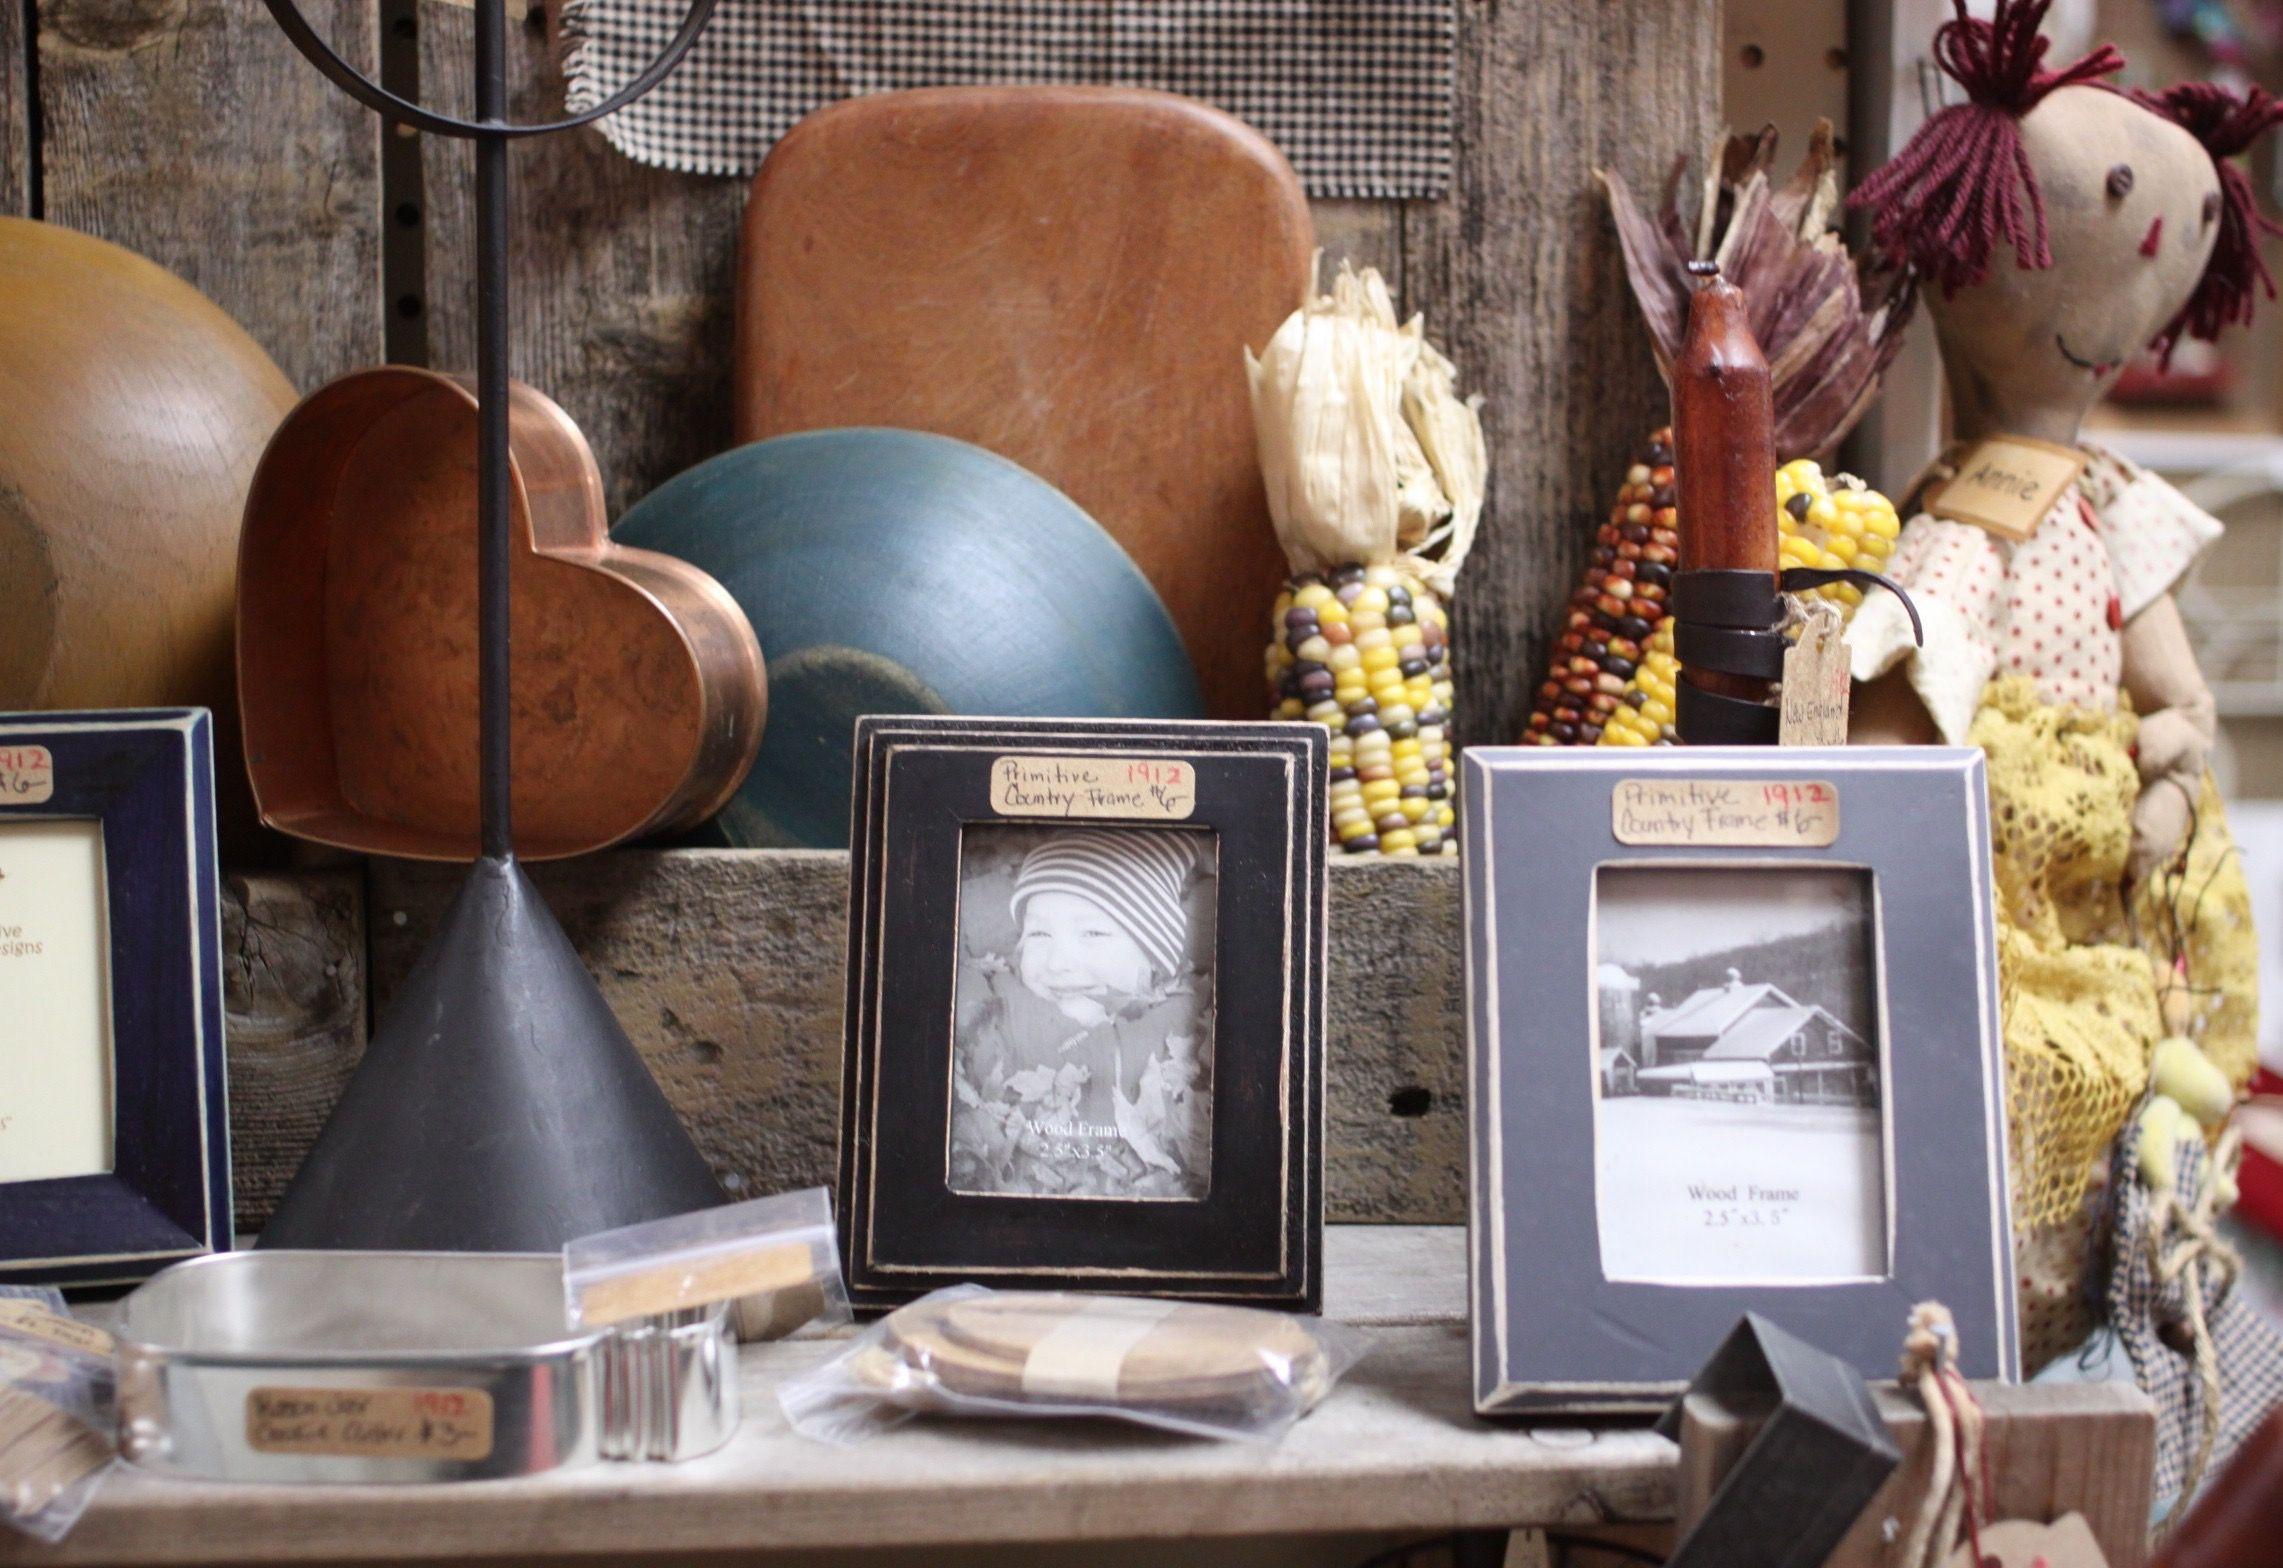 Photo Vignette Of Primitive Home Decor At Homestead Handcrafts, San Antonio,  Texas